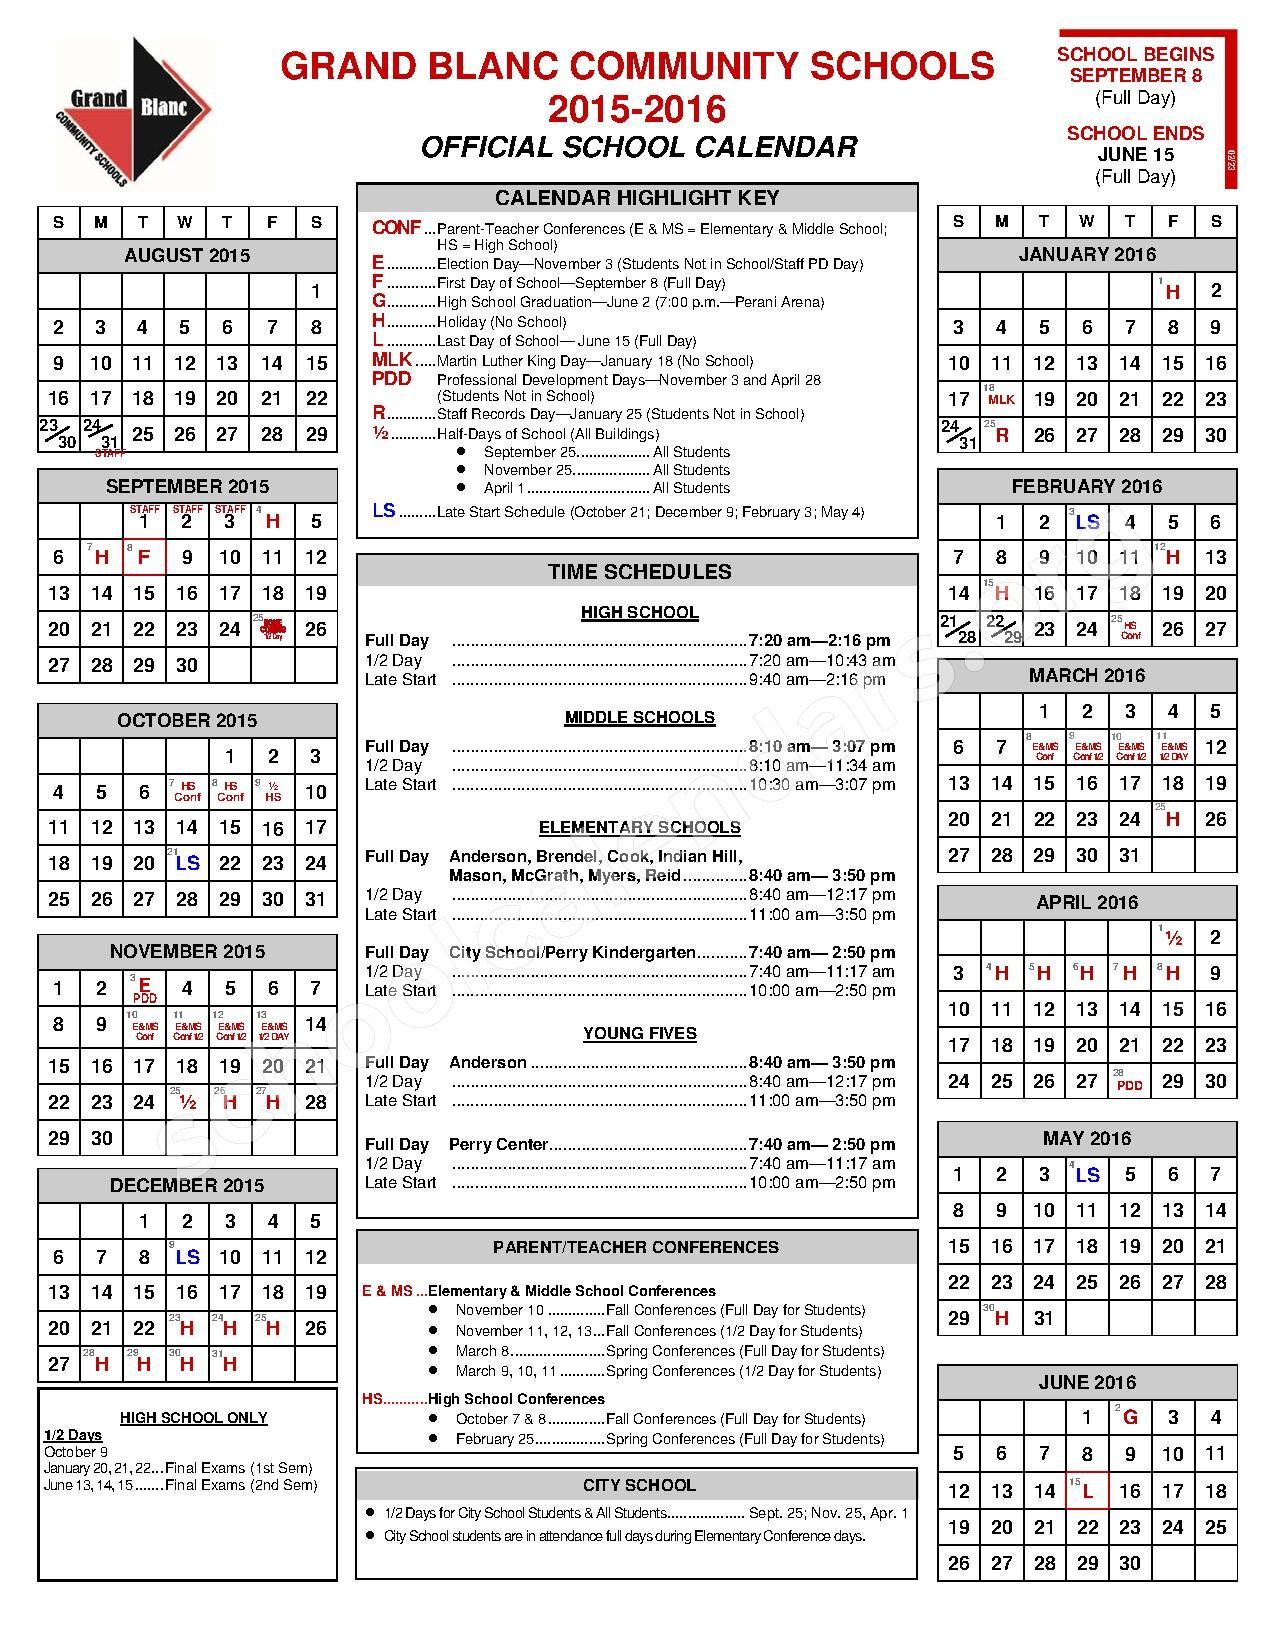 2015 - 2016 School Calendar – Grand Blanc Community Schools – page 1